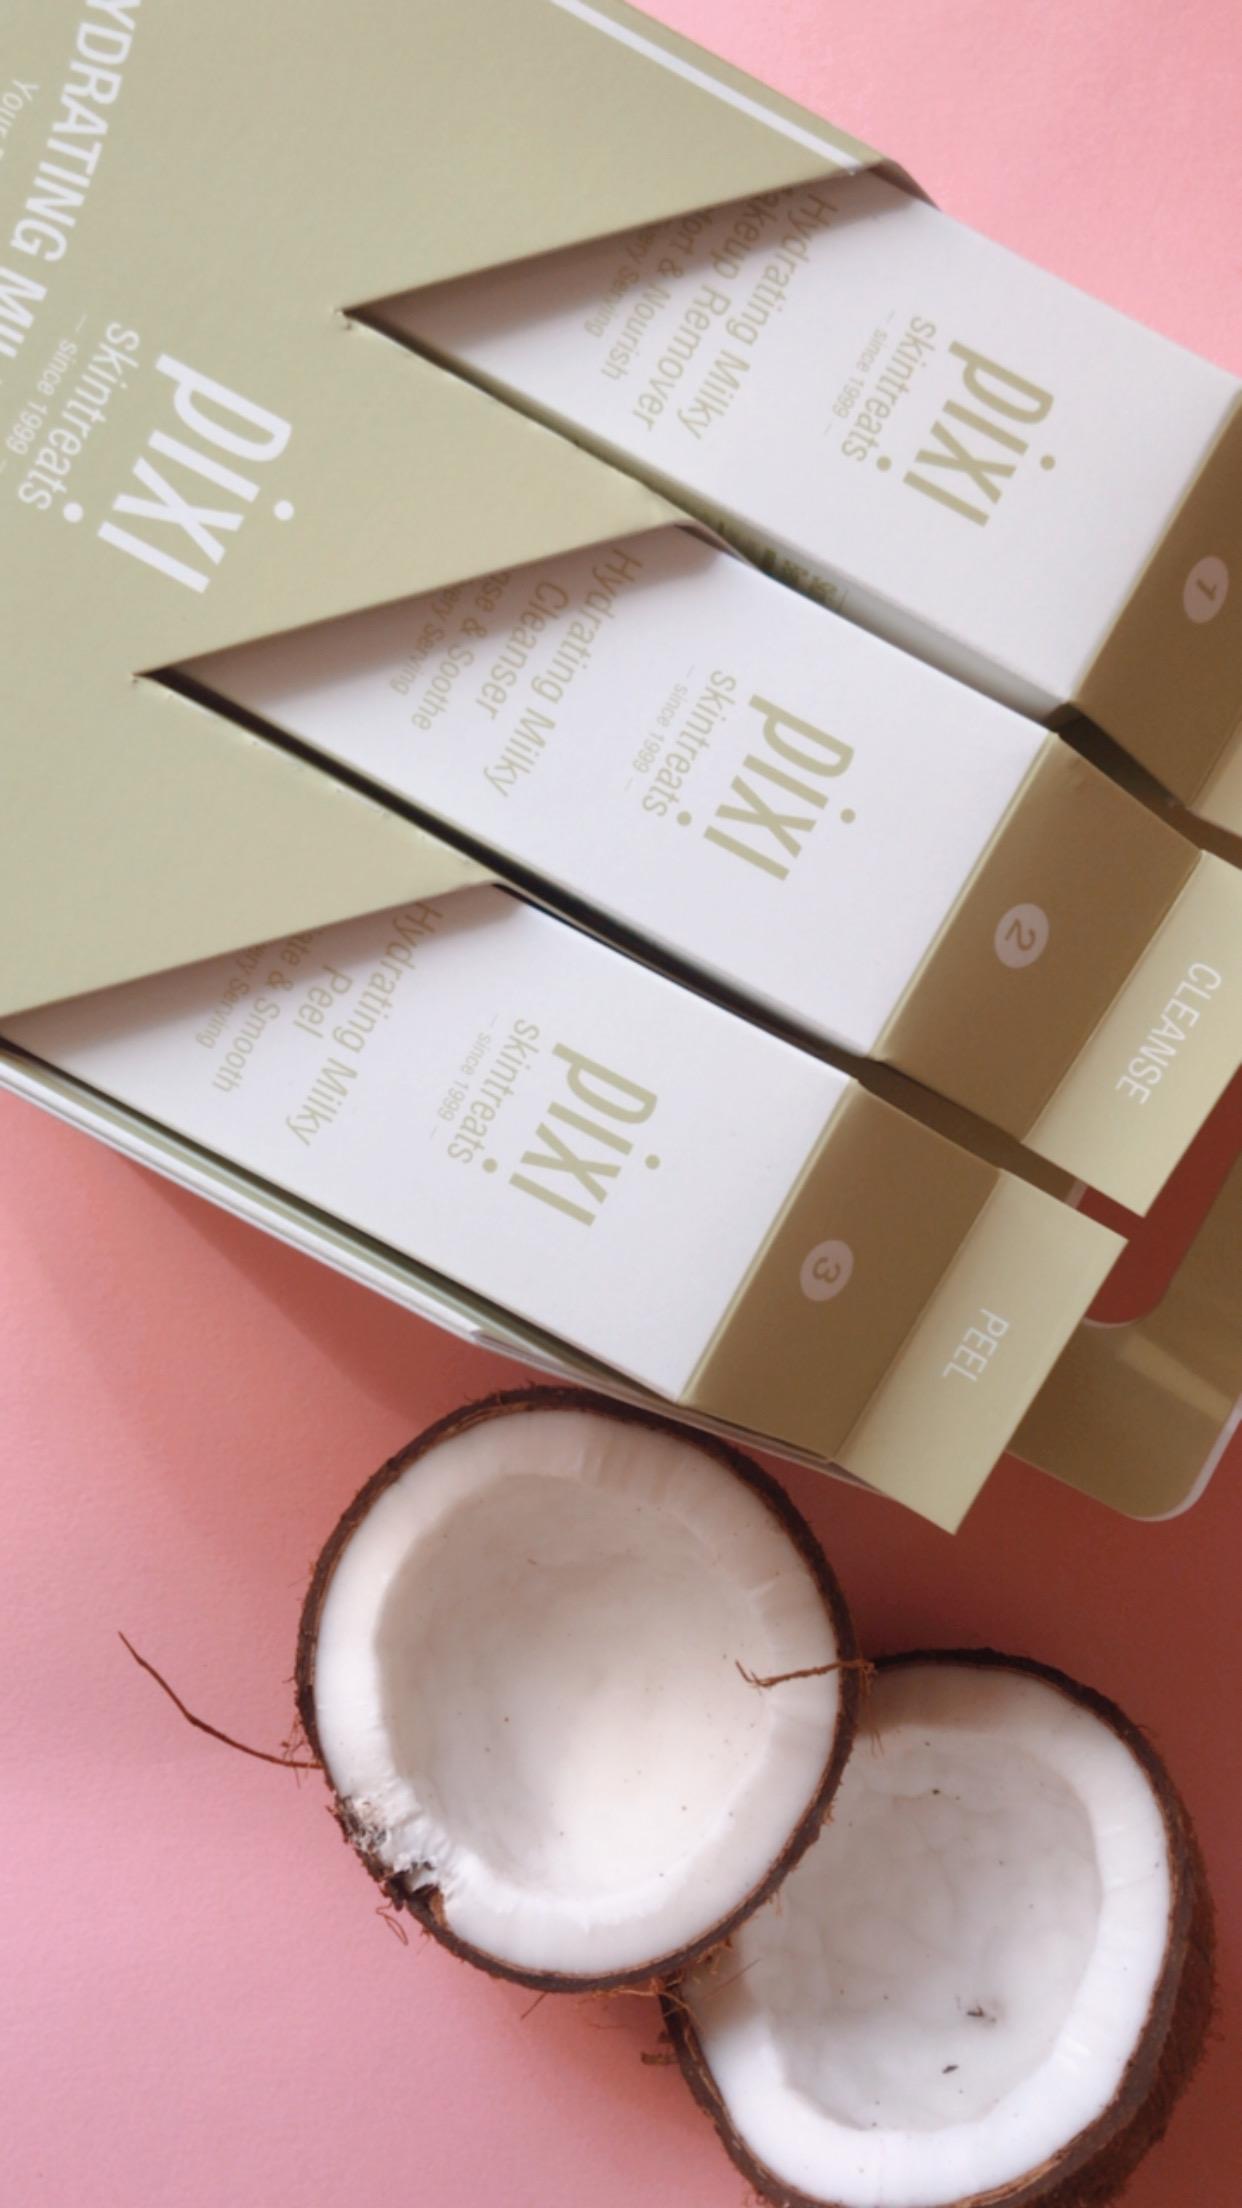 pixi milky collection.JPG